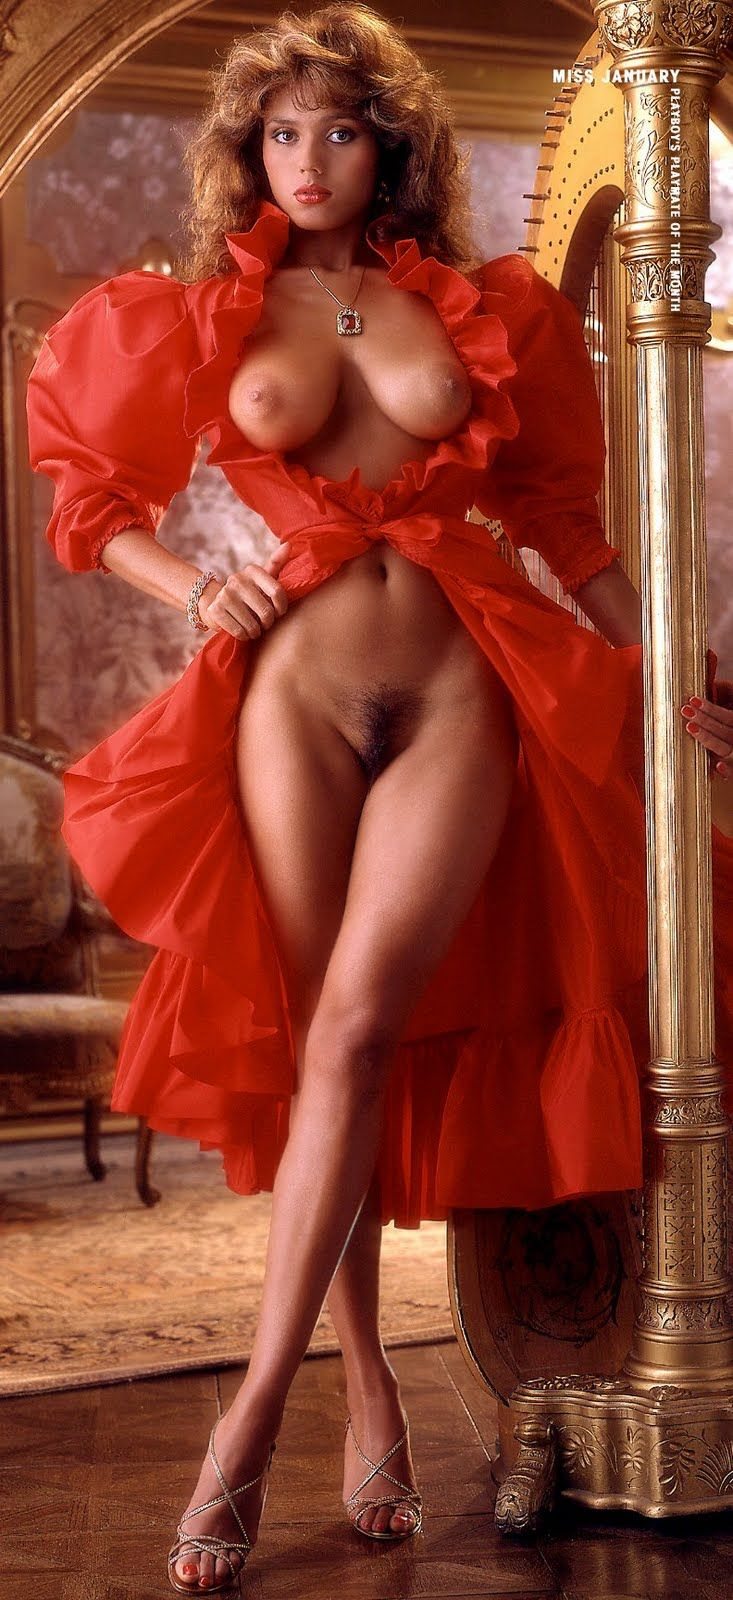 lonny chin playmate january '83 | things i love | pinterest